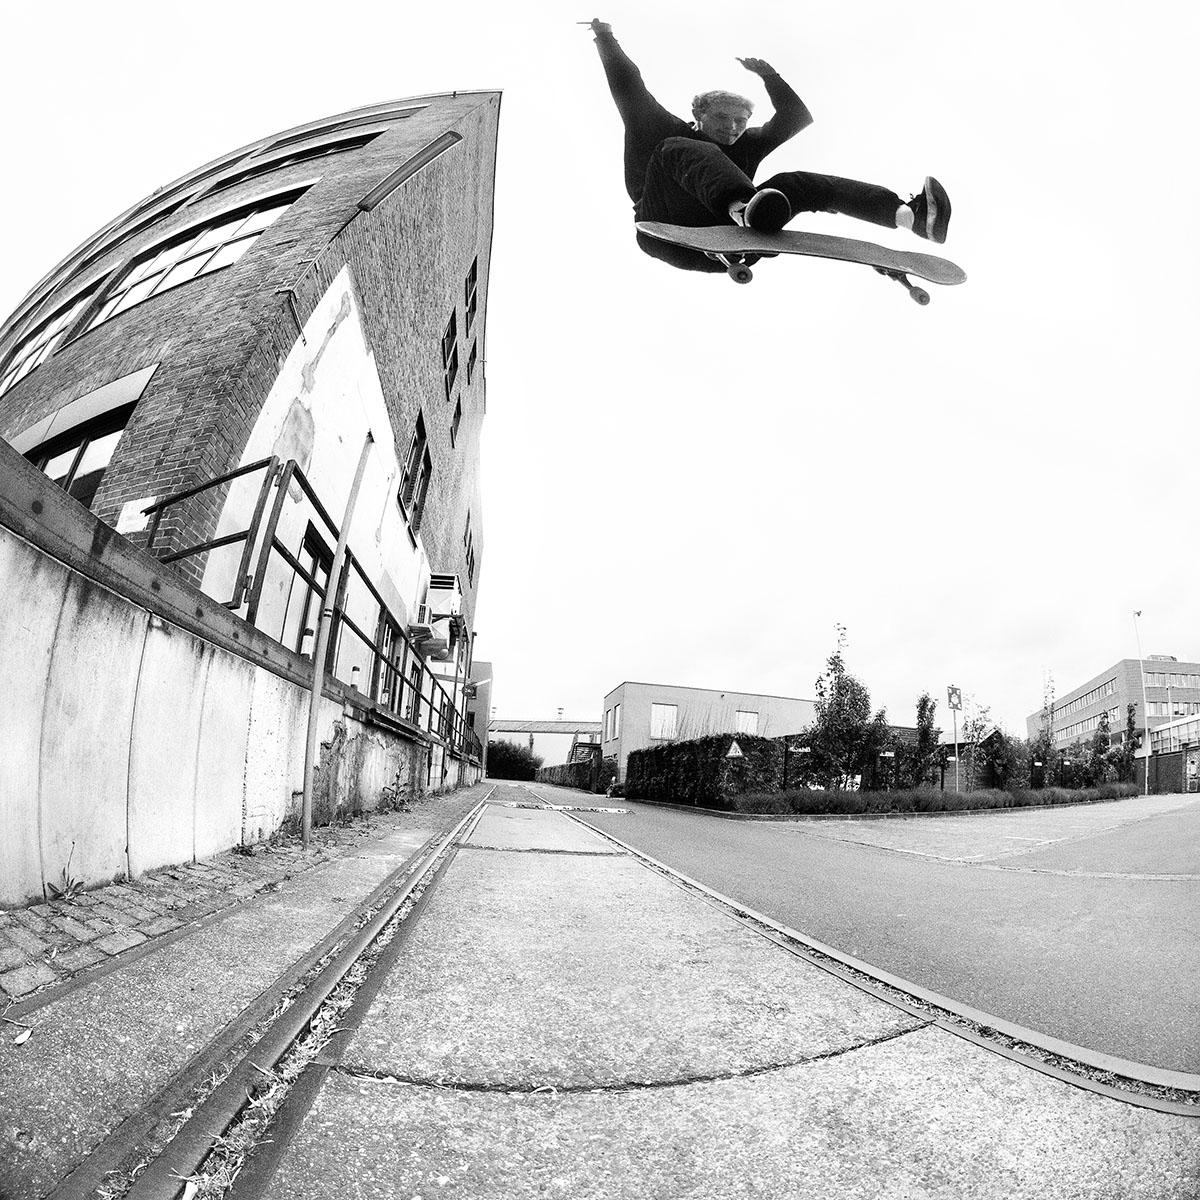 Niklas-Stube-Switch-Kickflip-robert-christ-irregularskatemag-40